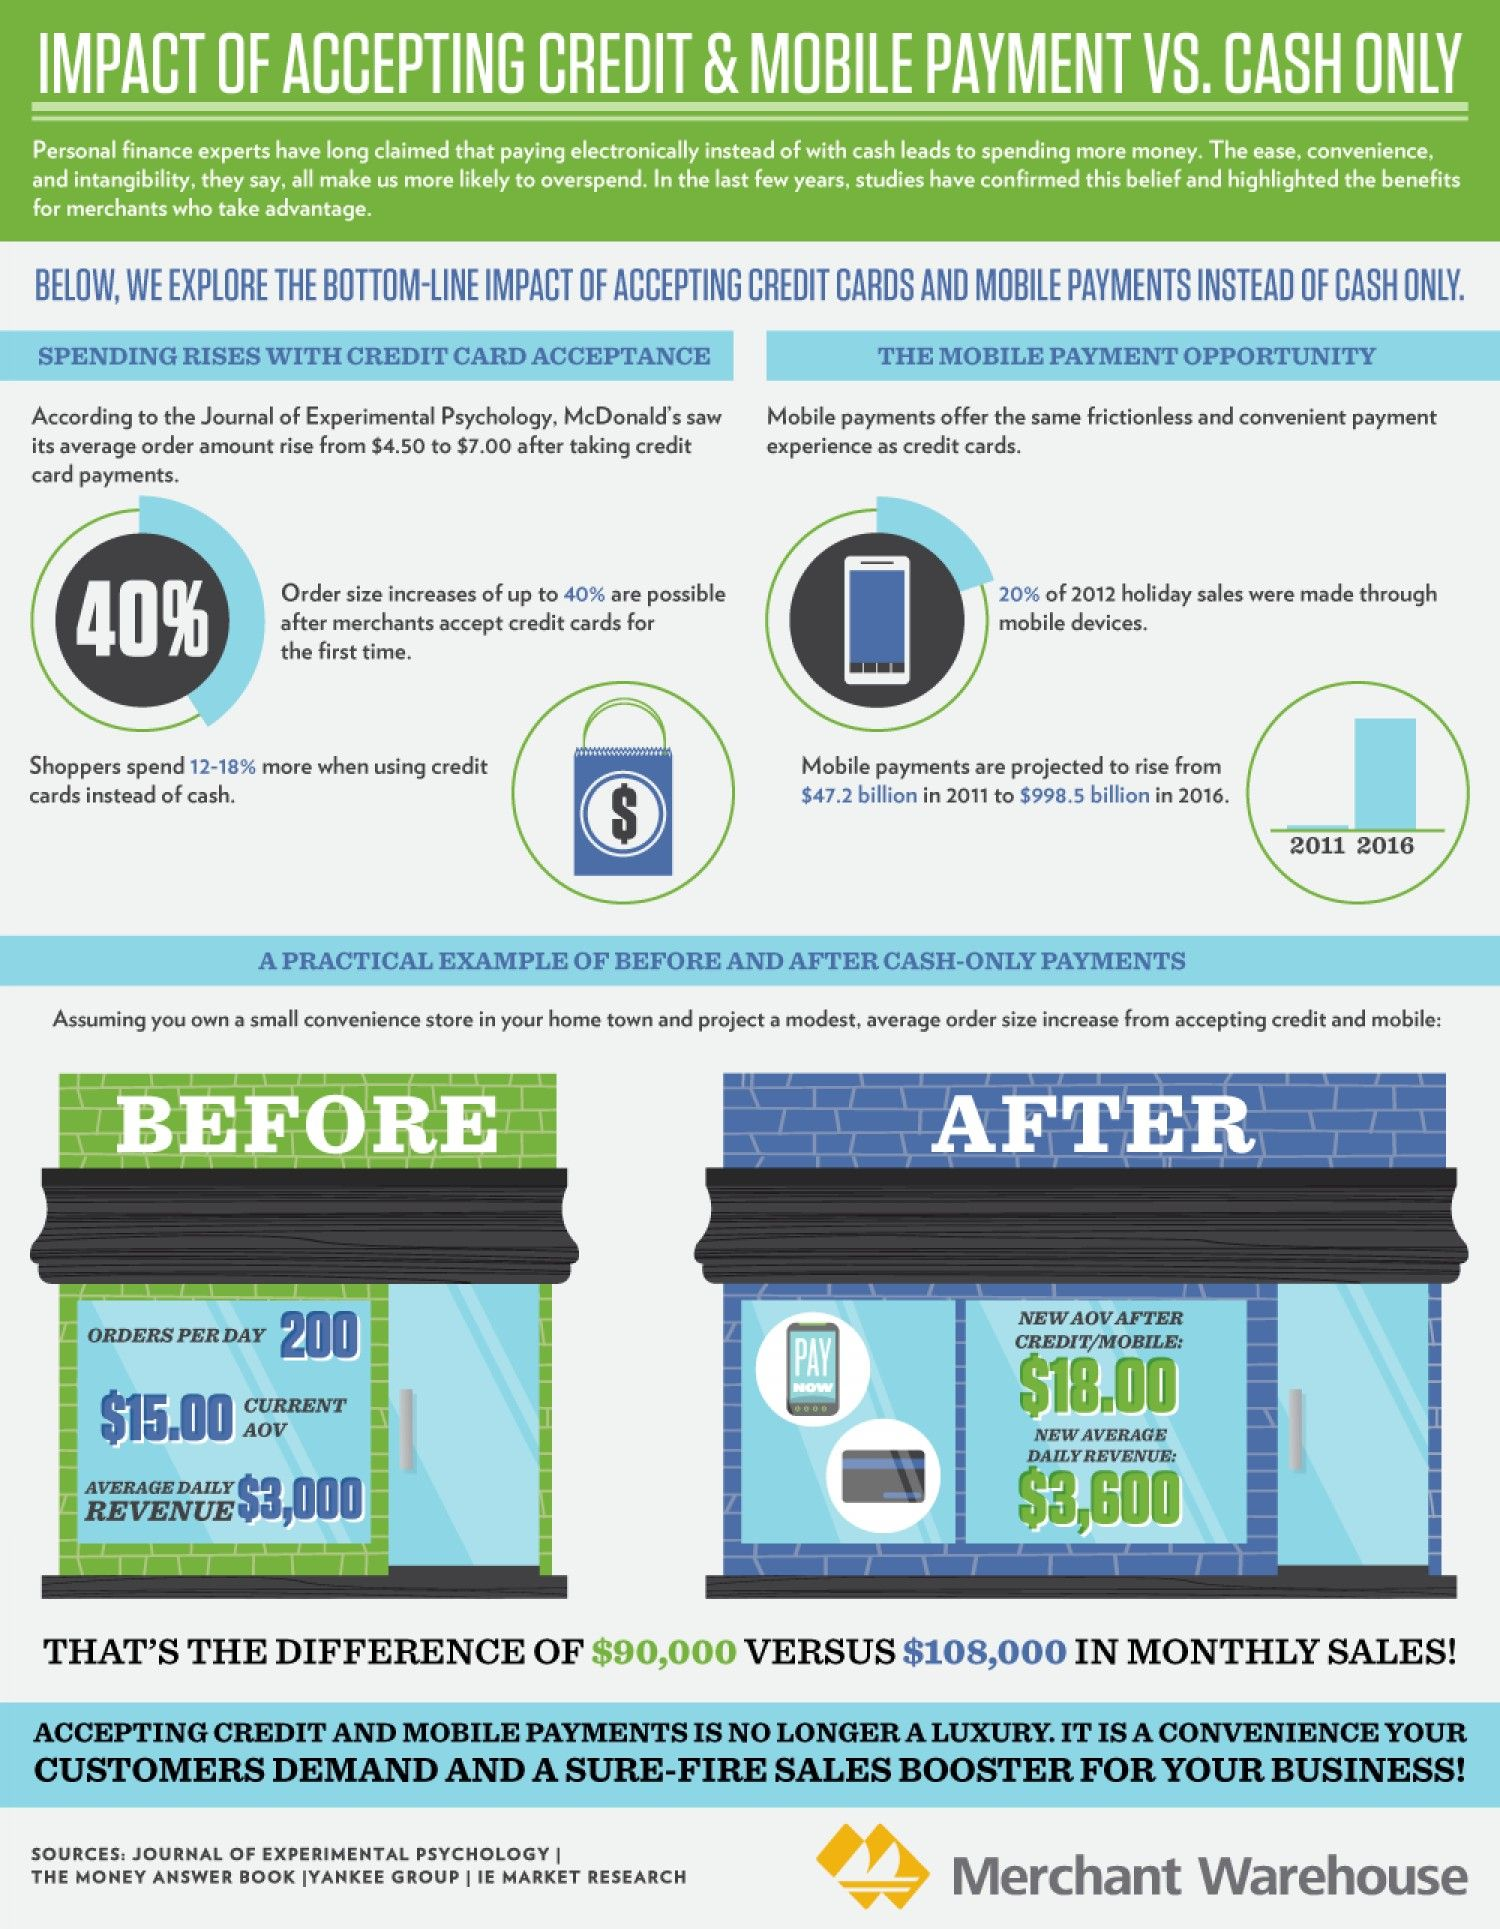 This infographic explores the bottom-line impact of merchants ...